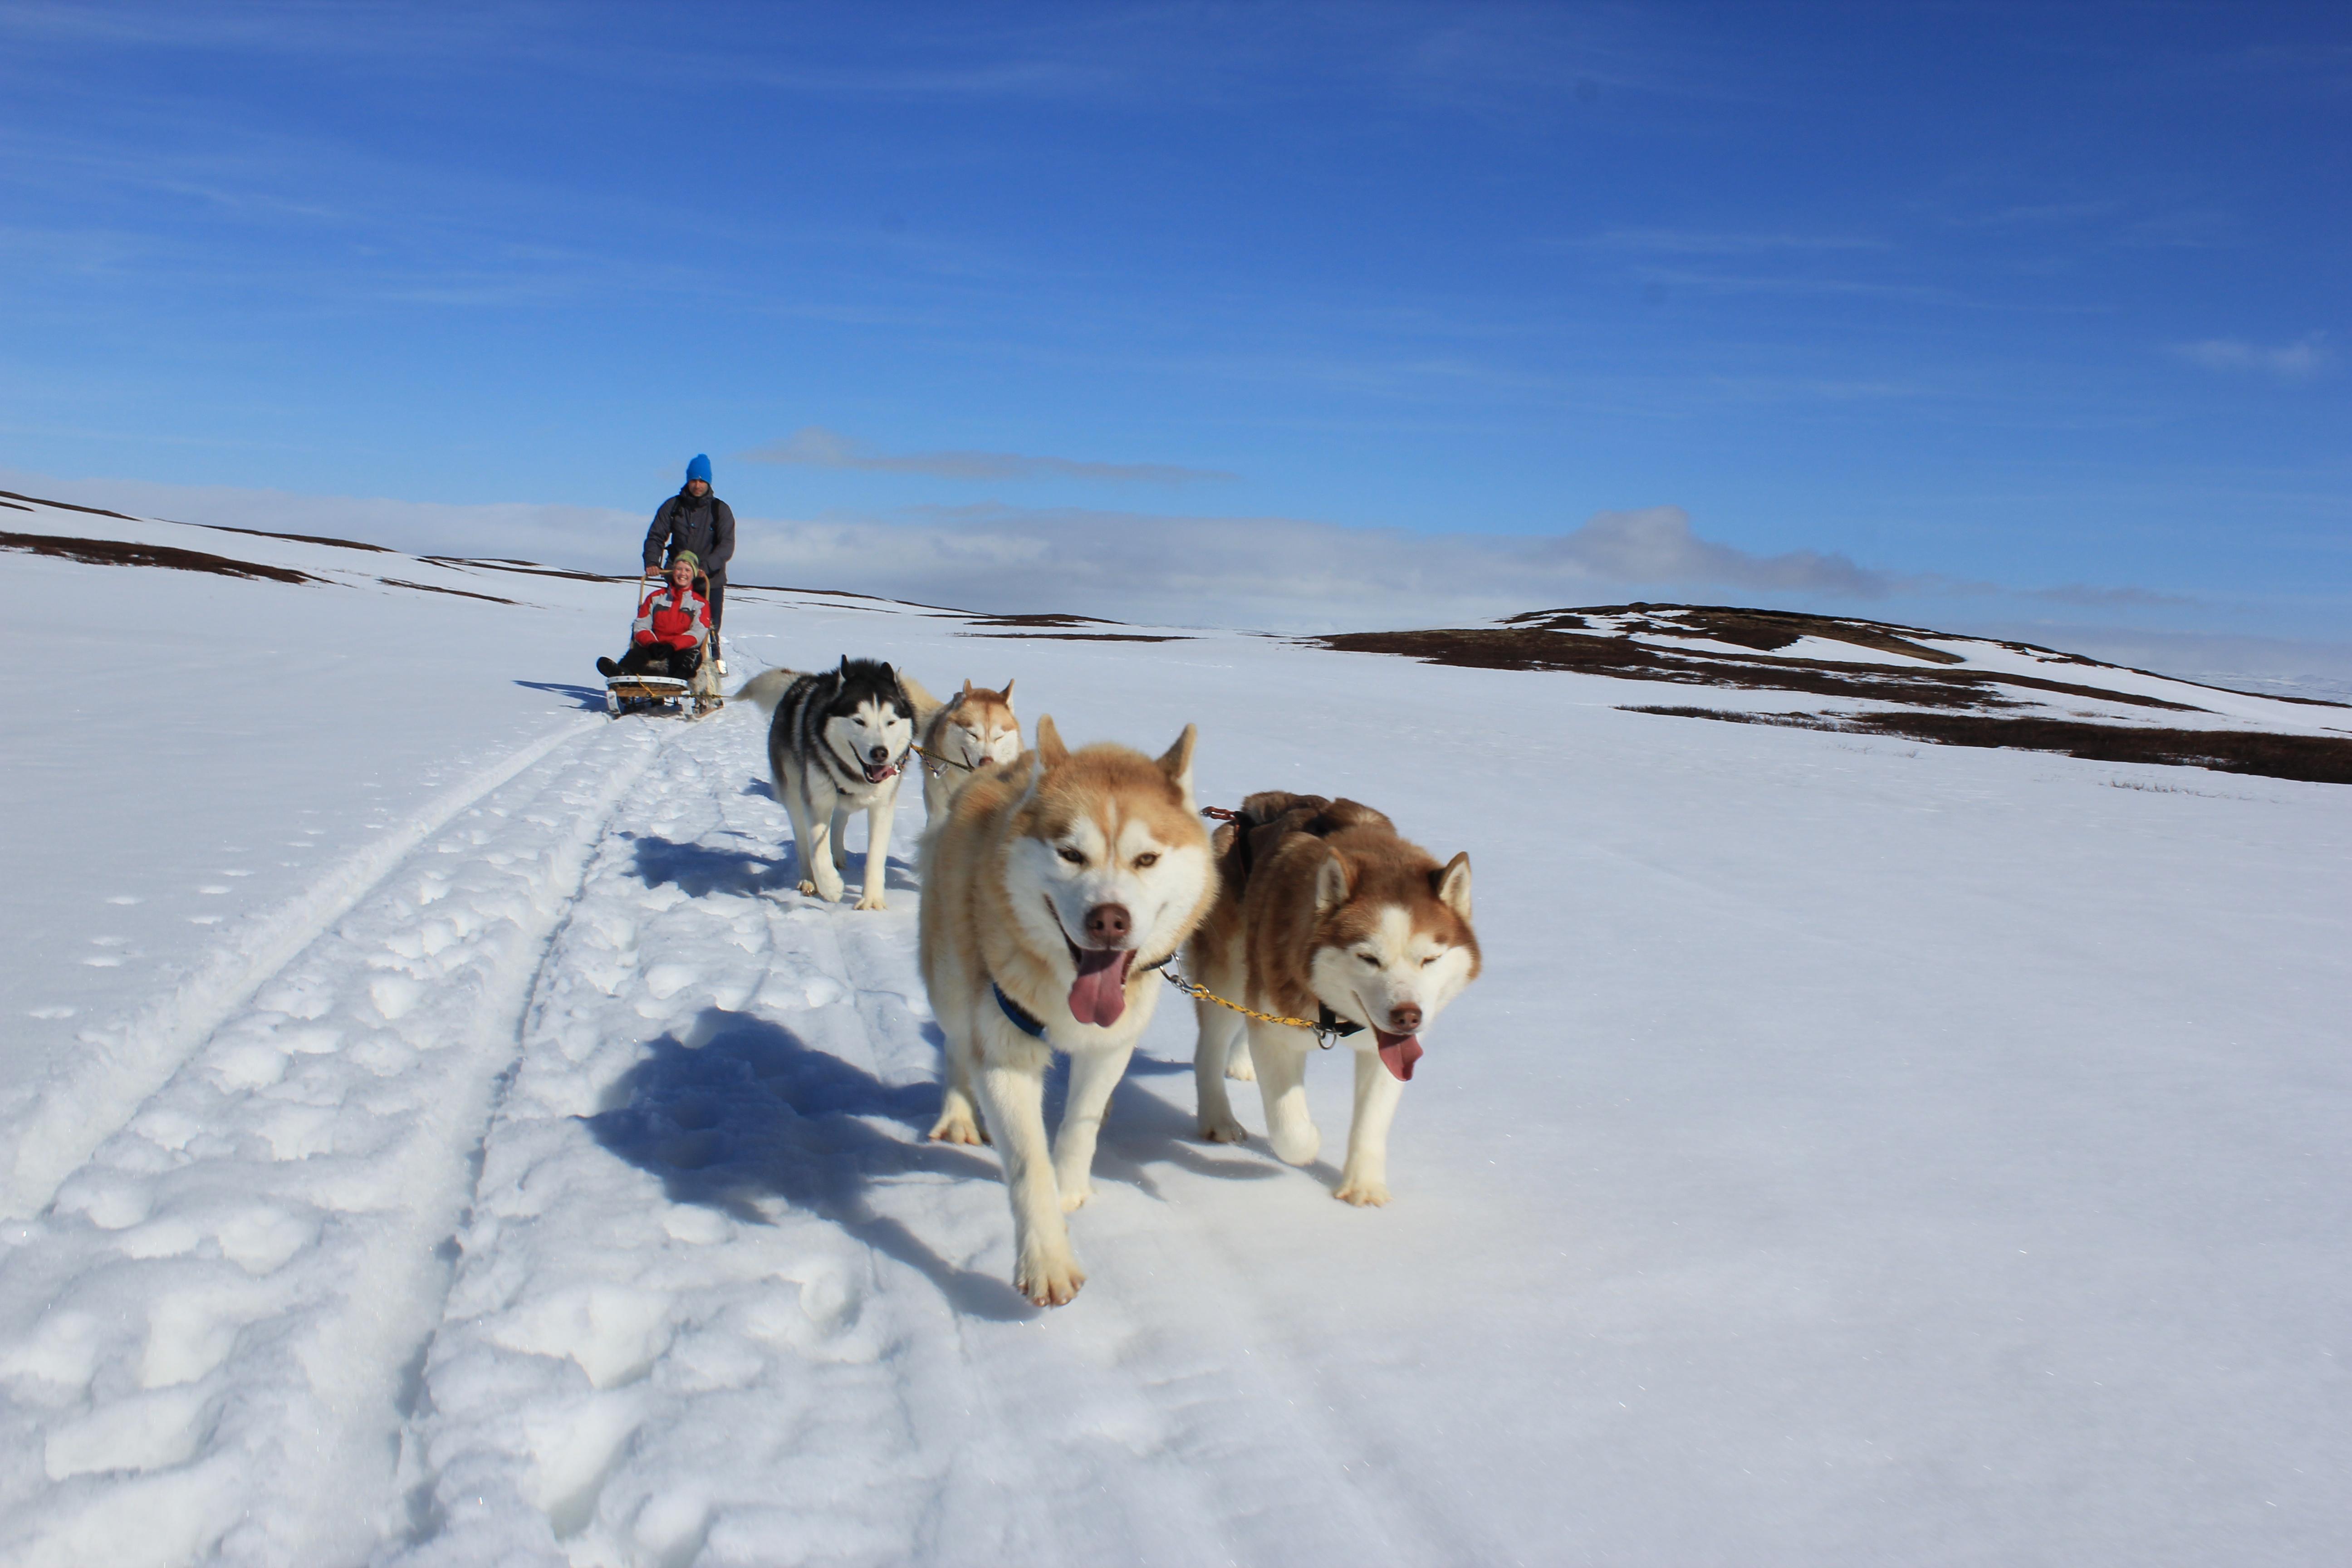 Attraversa la campagna islandese su una slitta trainata da Husky siberiani.